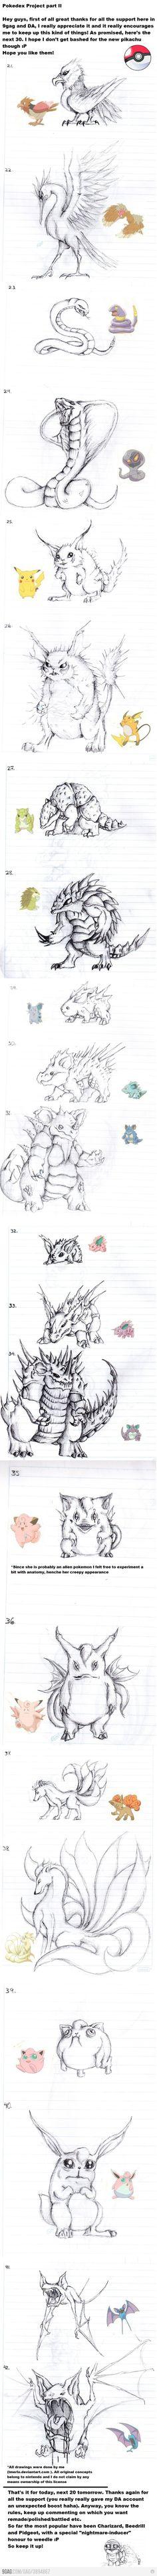 Pokemon re-imagined part 2